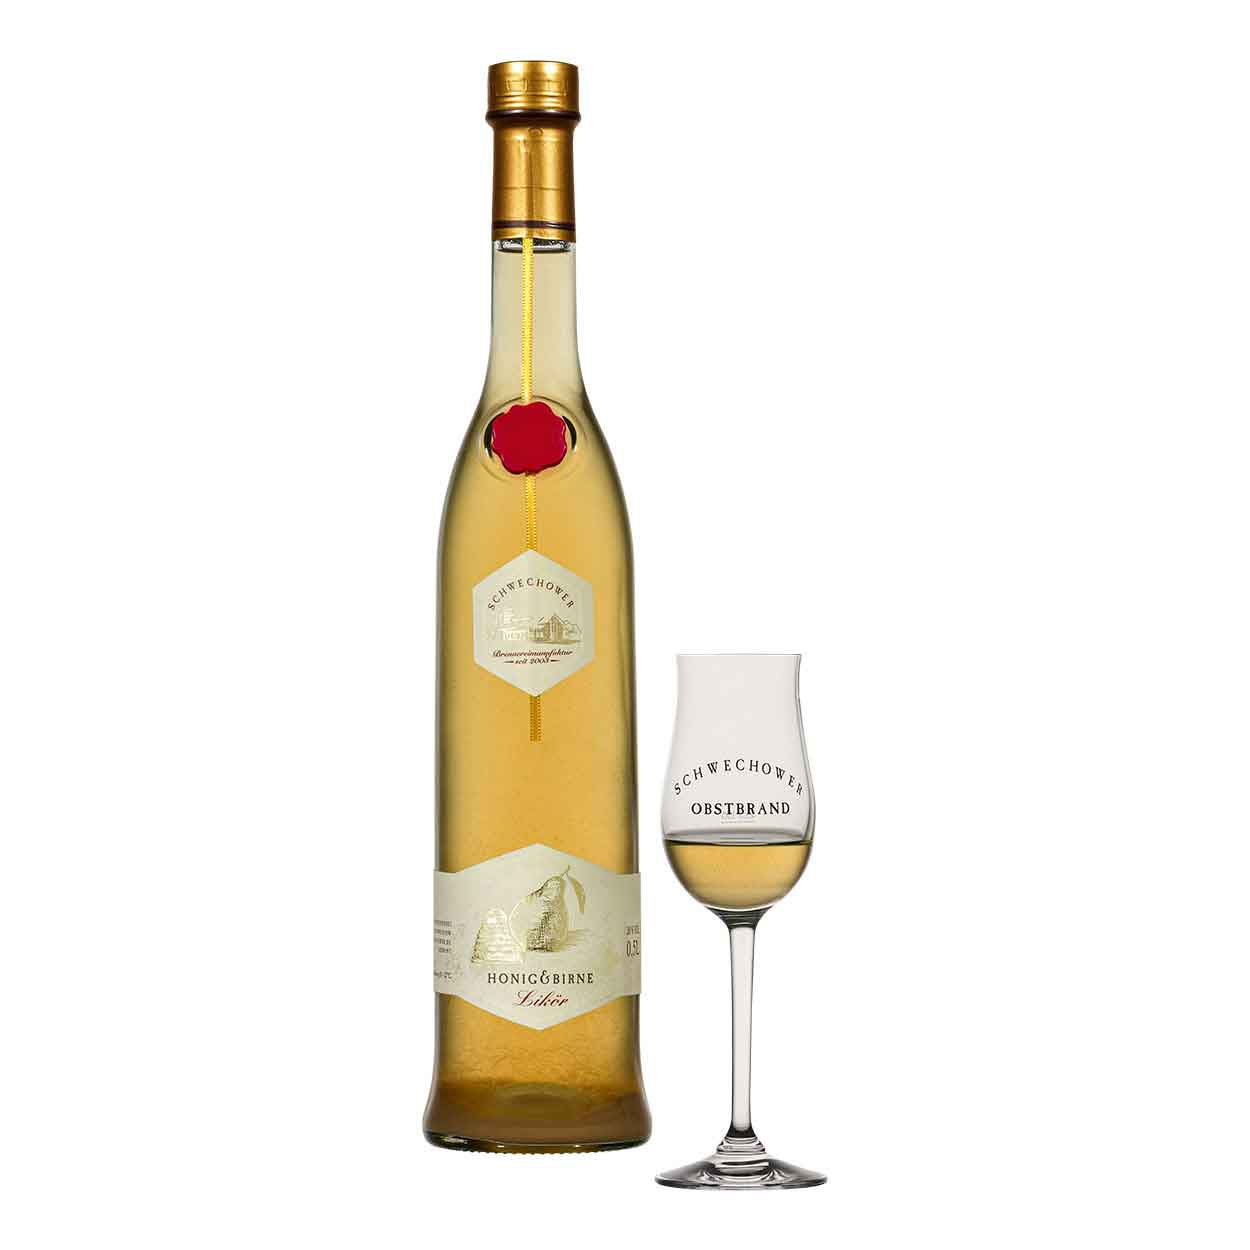 Schwechower-Honig-Birne-Likor-500ml-2